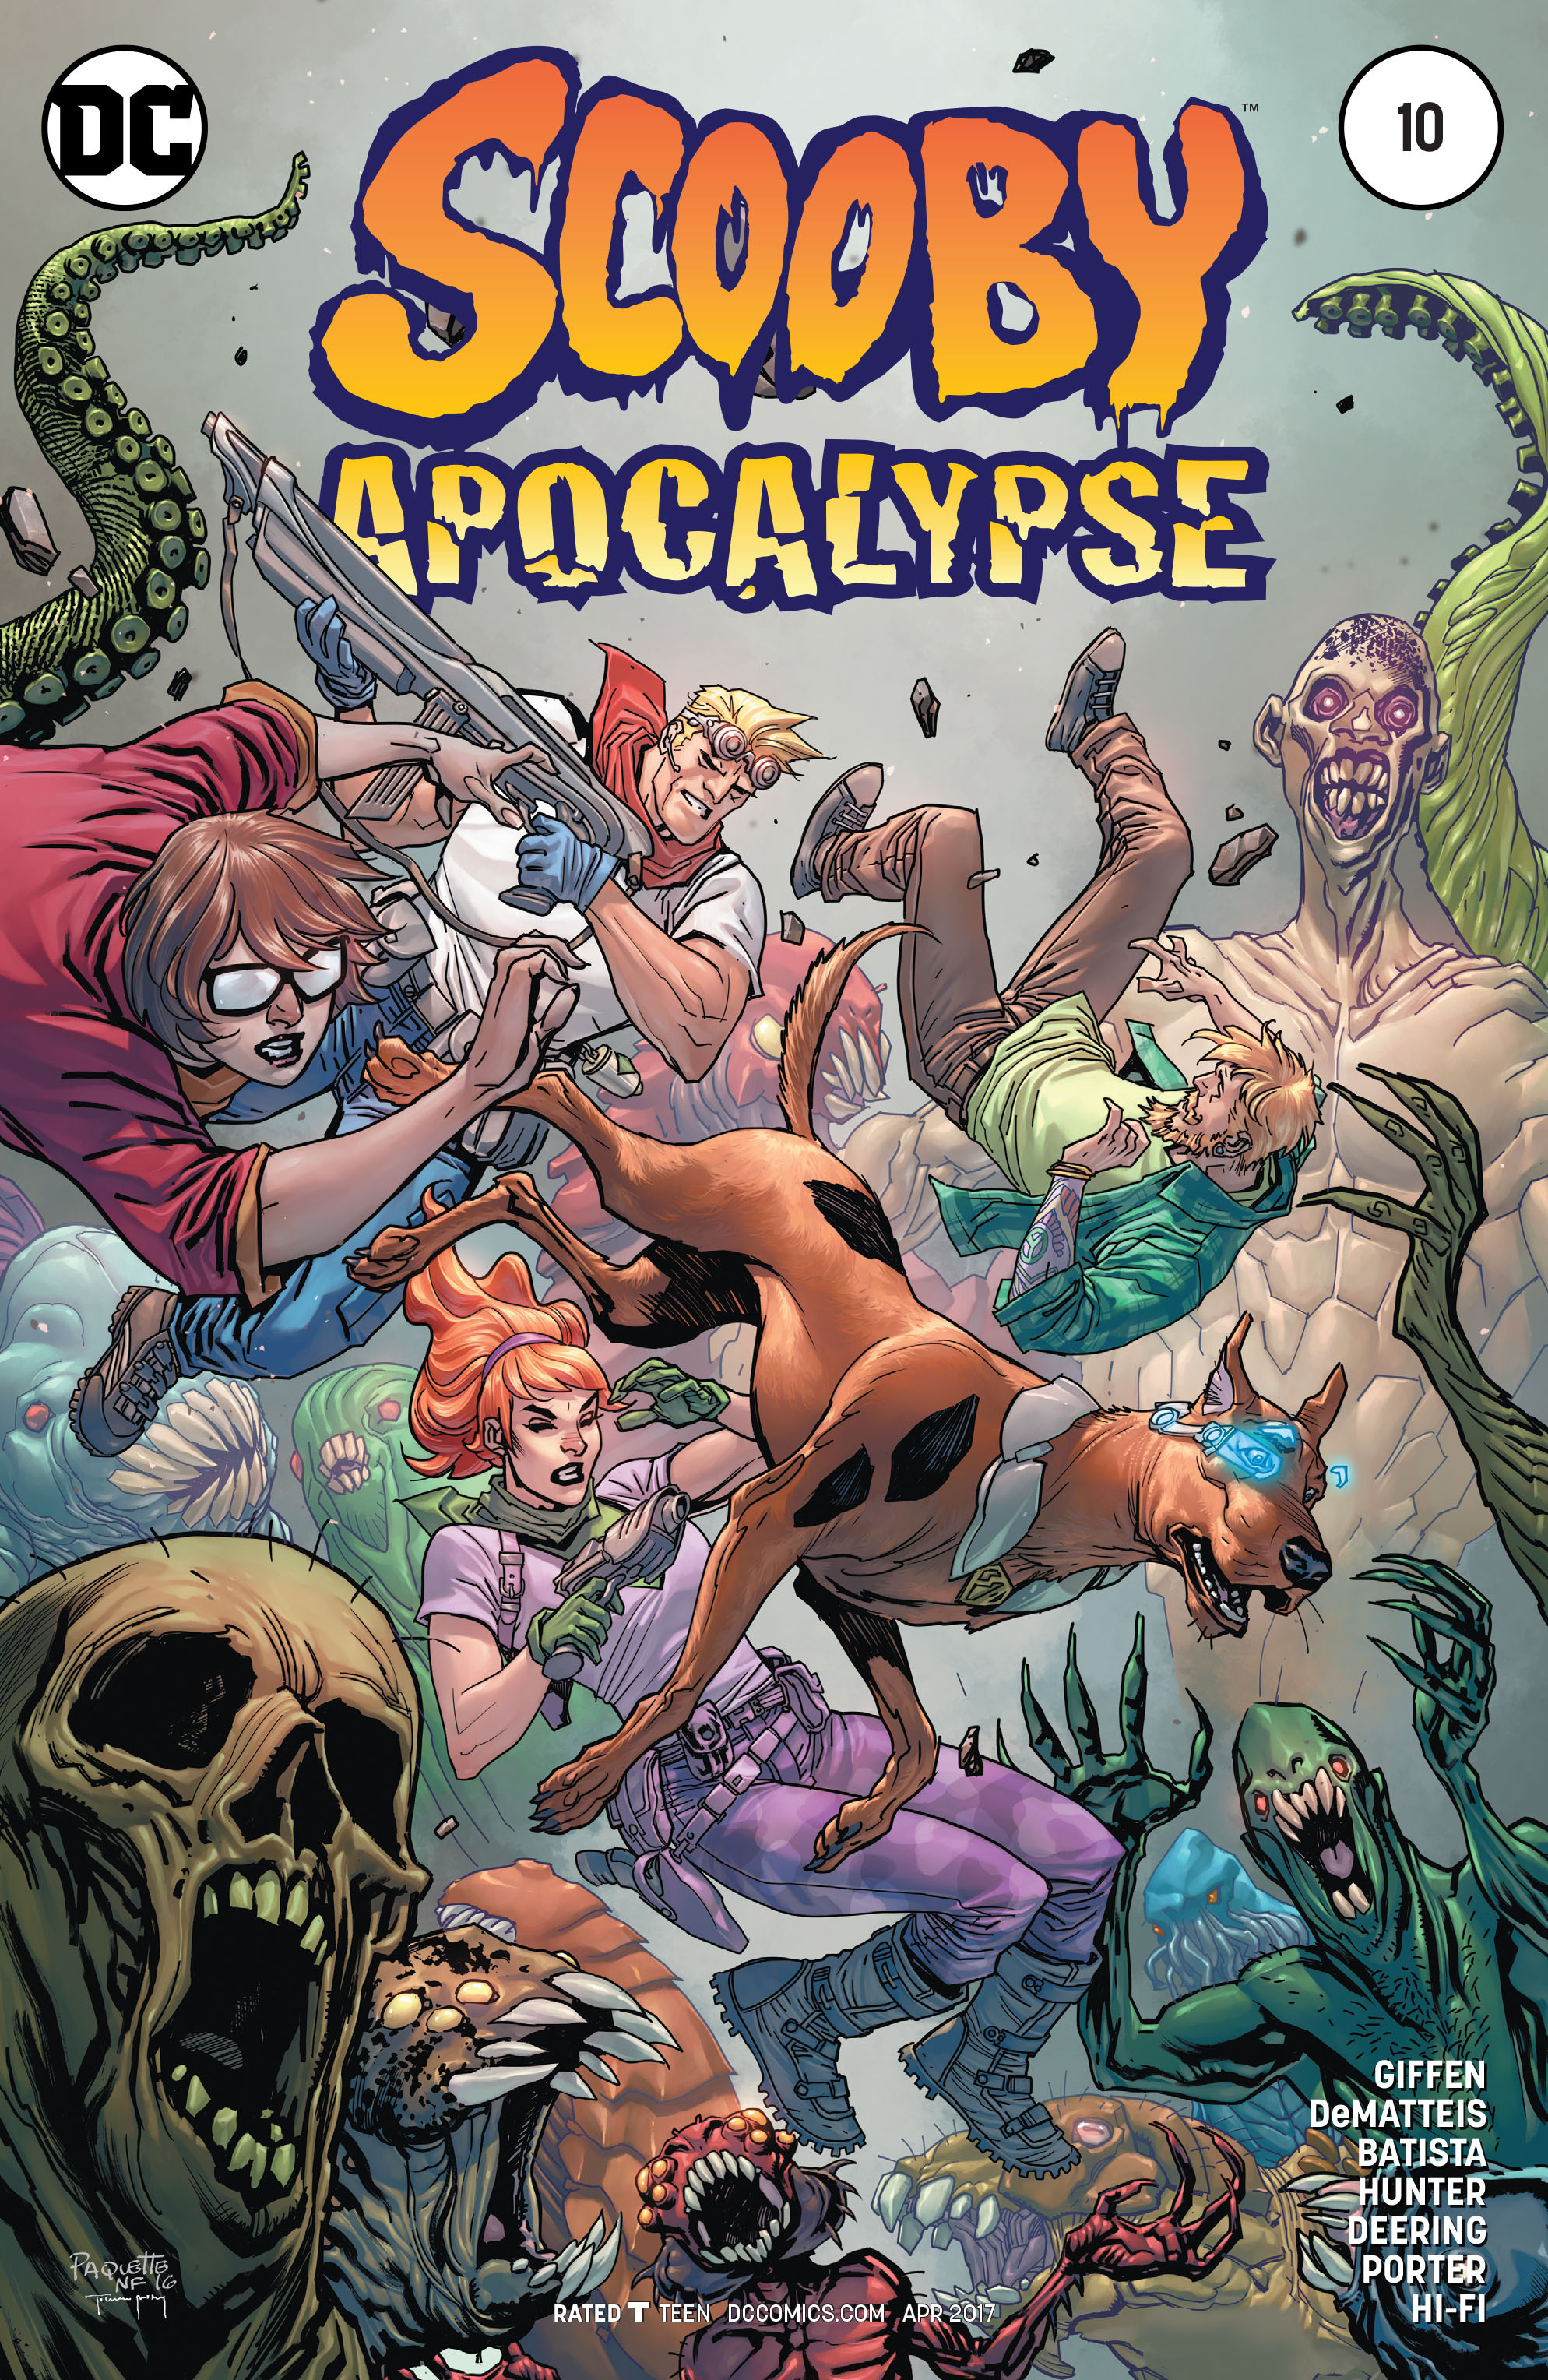 Read online Scooby Apocalypse comic -  Issue #10 - 3